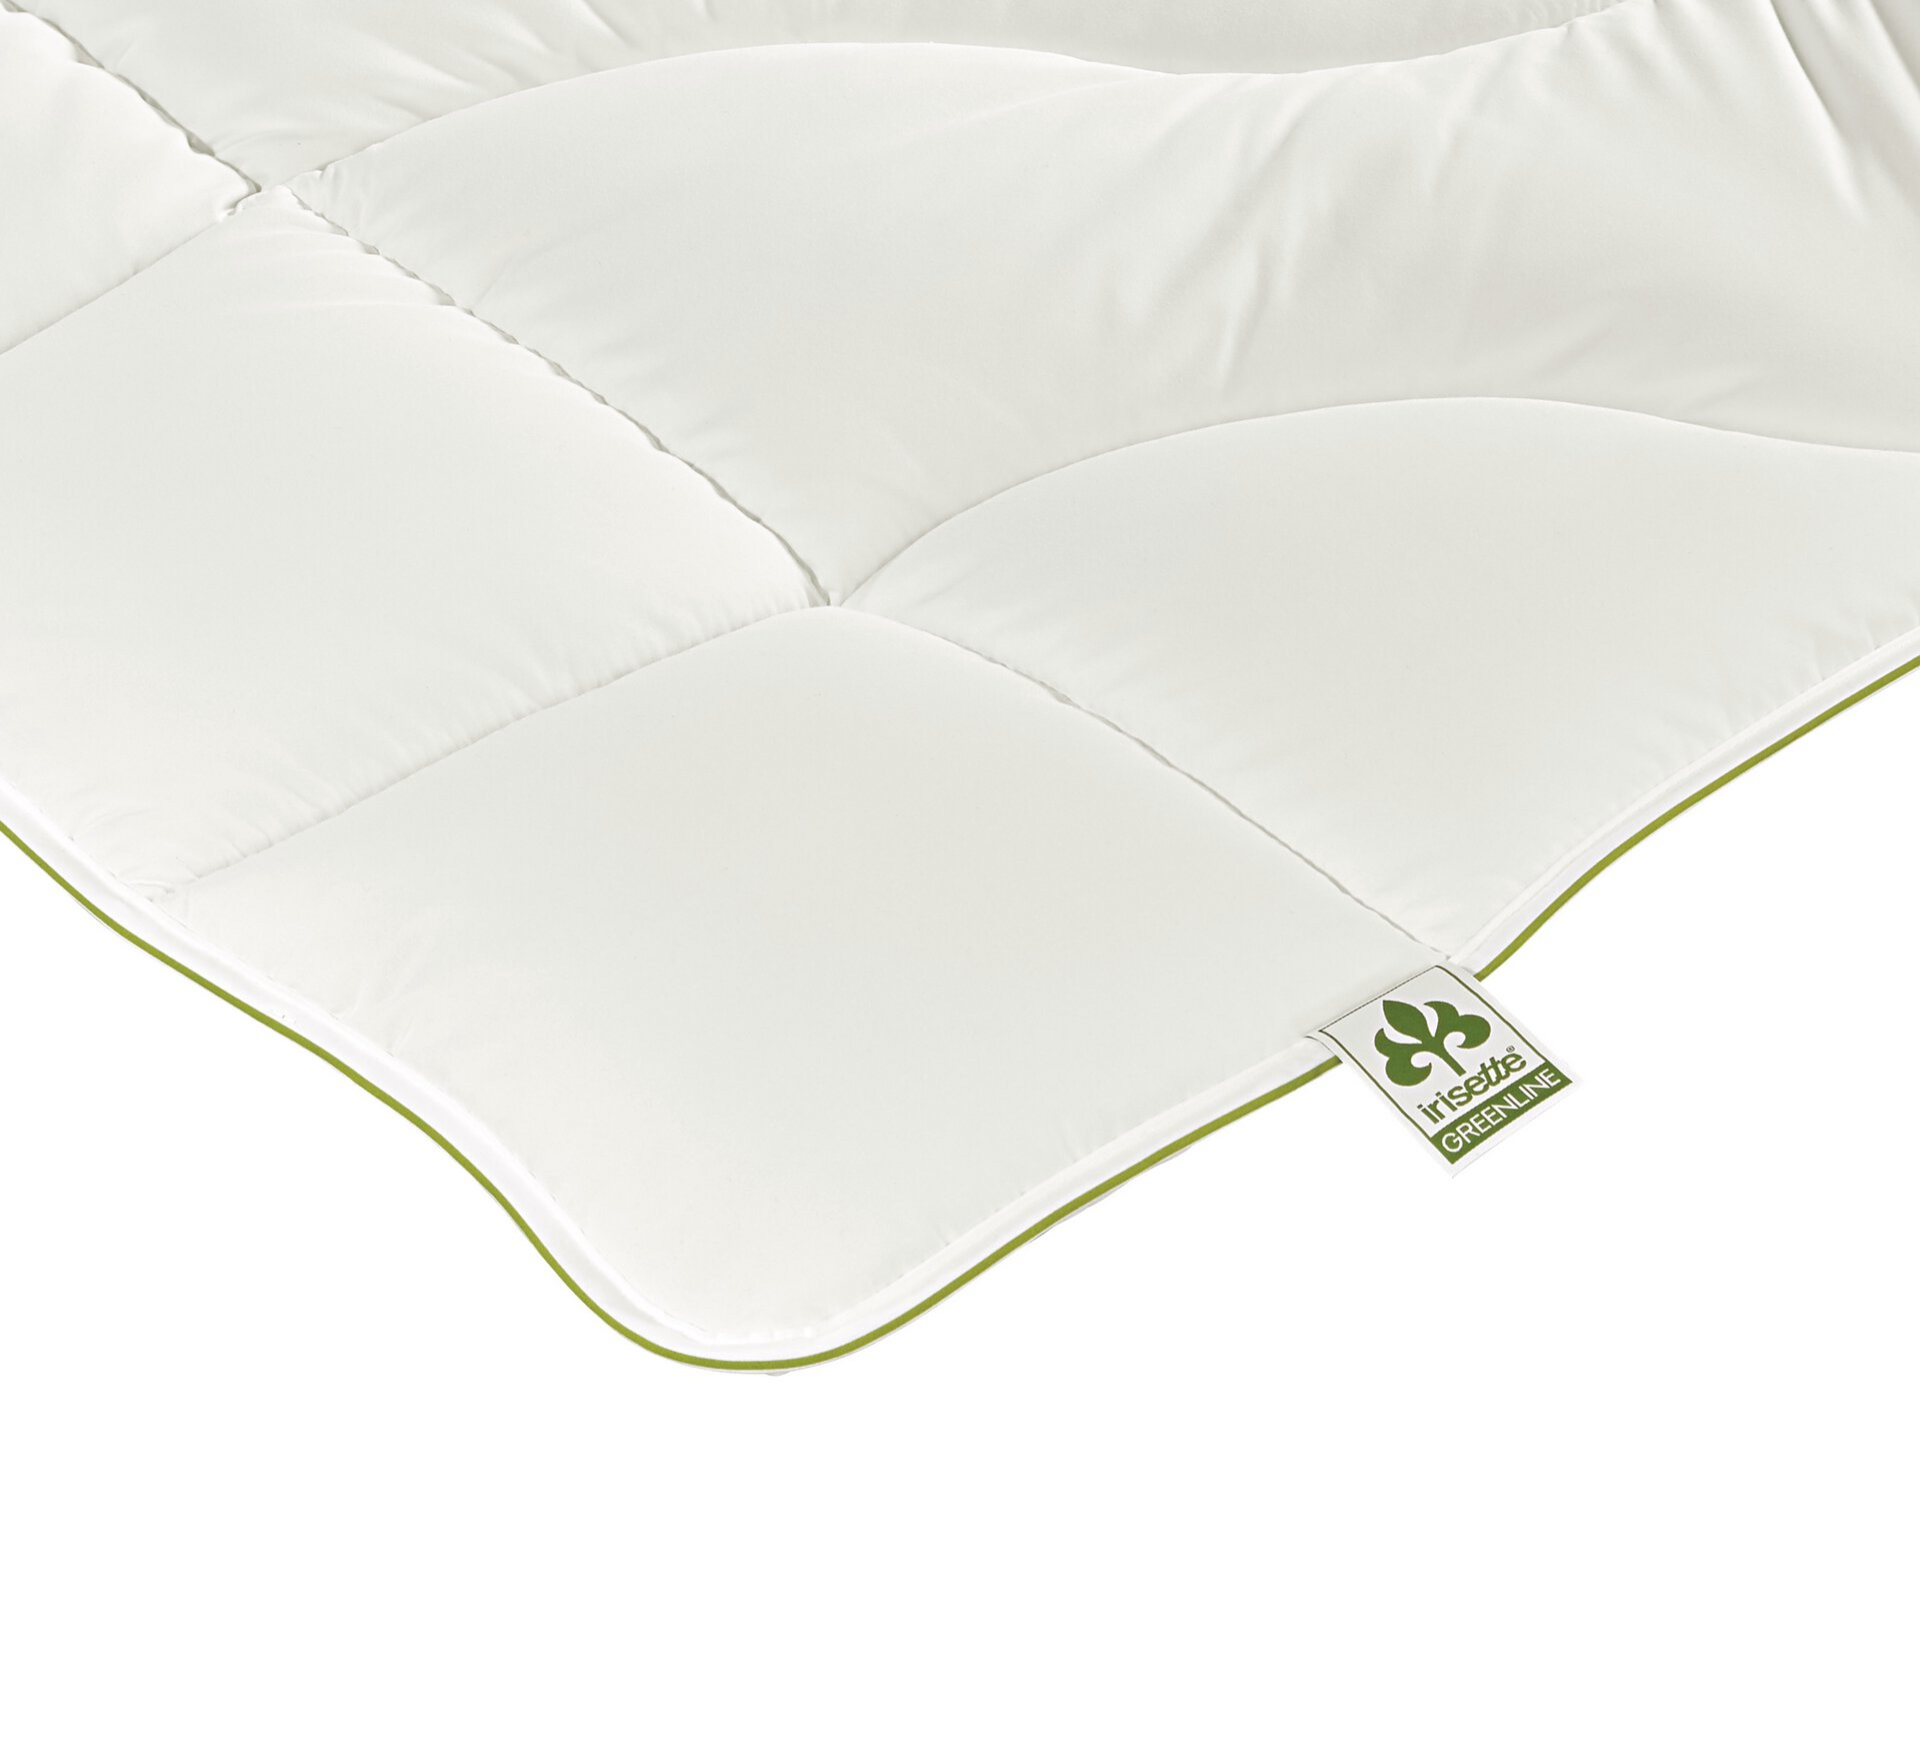 Lightdecke Cyclafill ECO leicht Badenia Irisette Greenline Textil weiß 155 x 200 cm